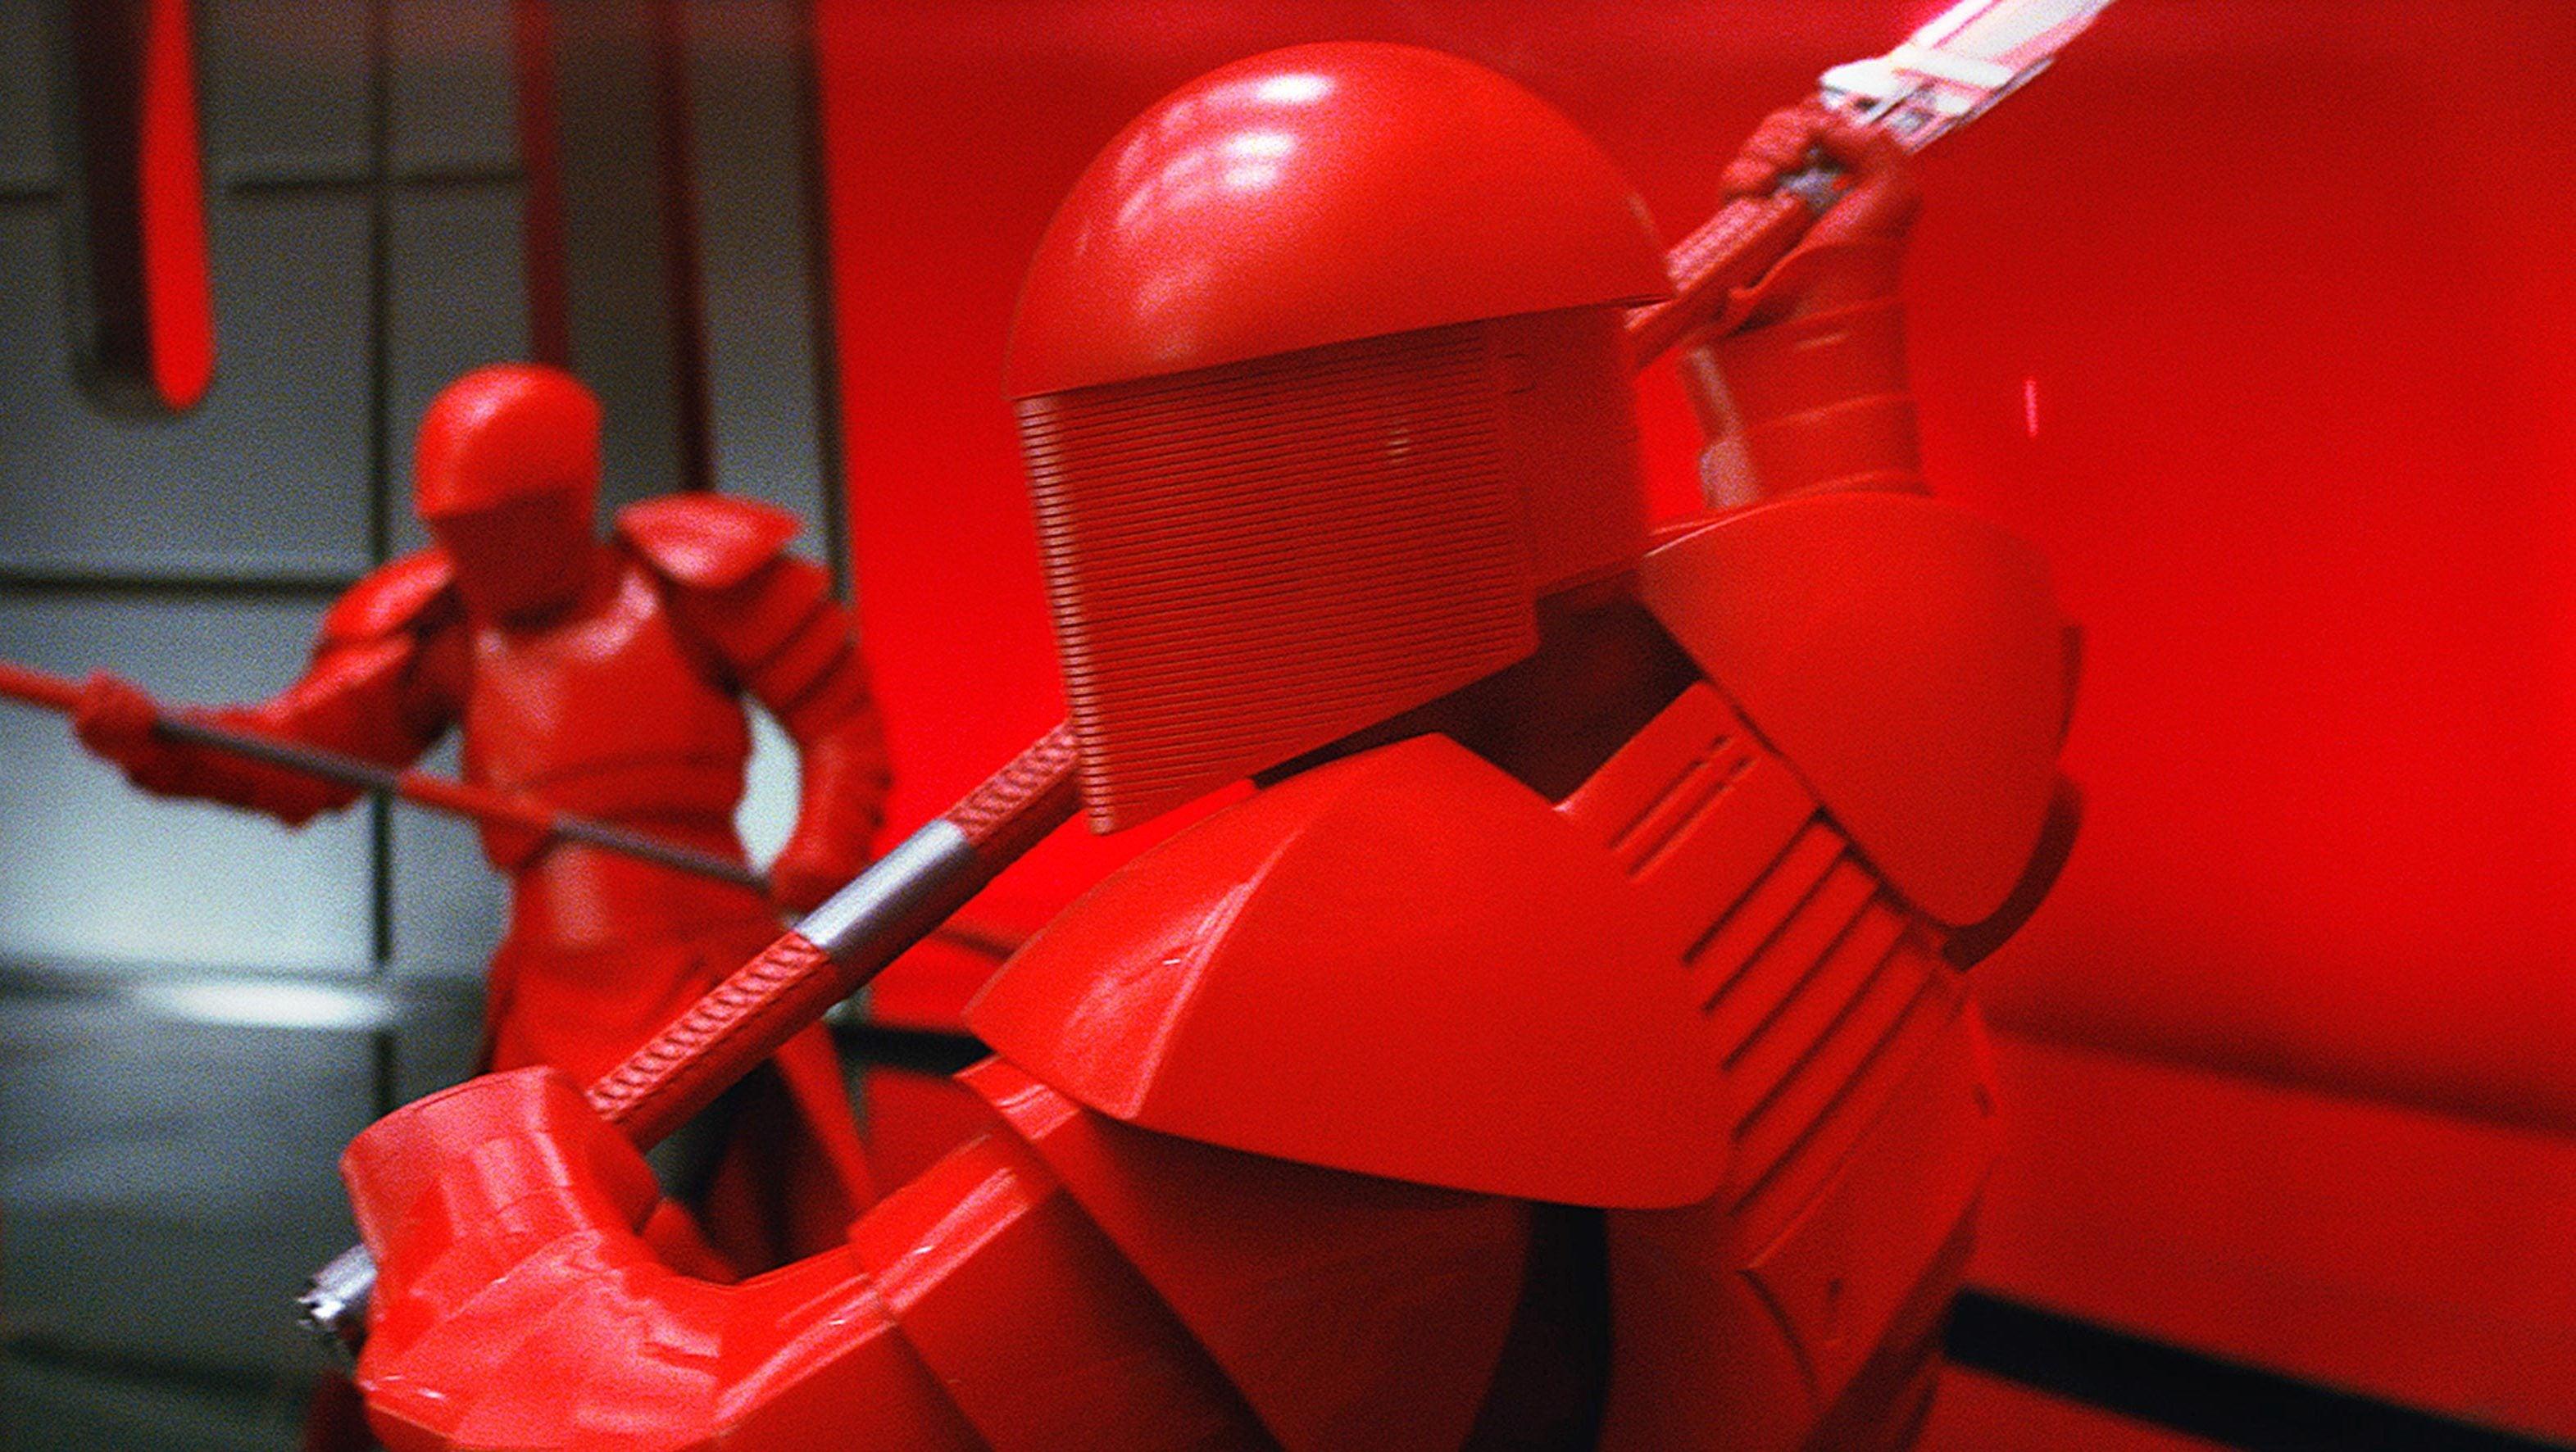 Everybody Cut Loose, Force-Loose, Kick A PraetorianGuard In The Caboose